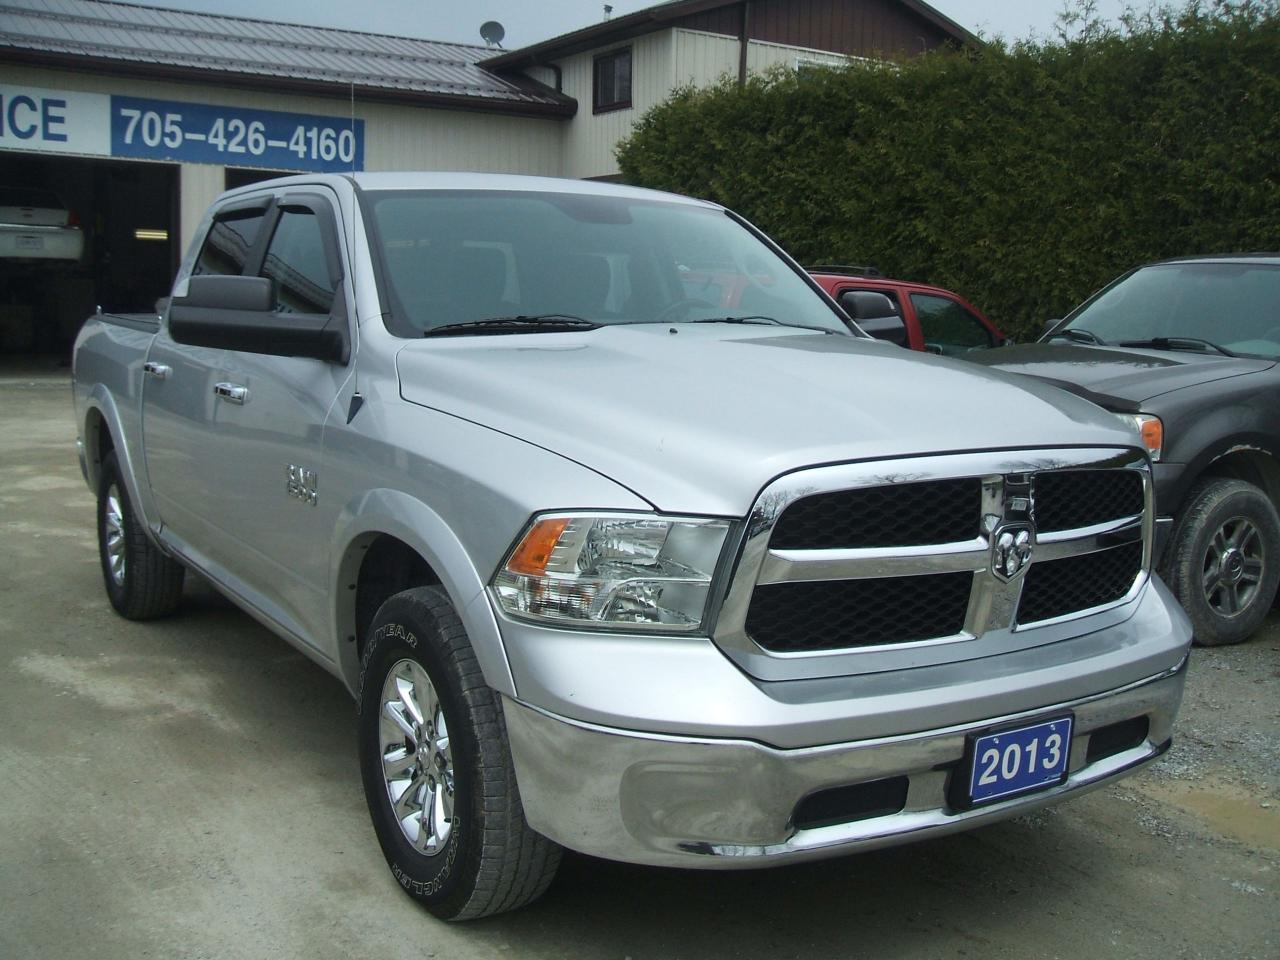 Photo of Silver 2013 RAM 1500